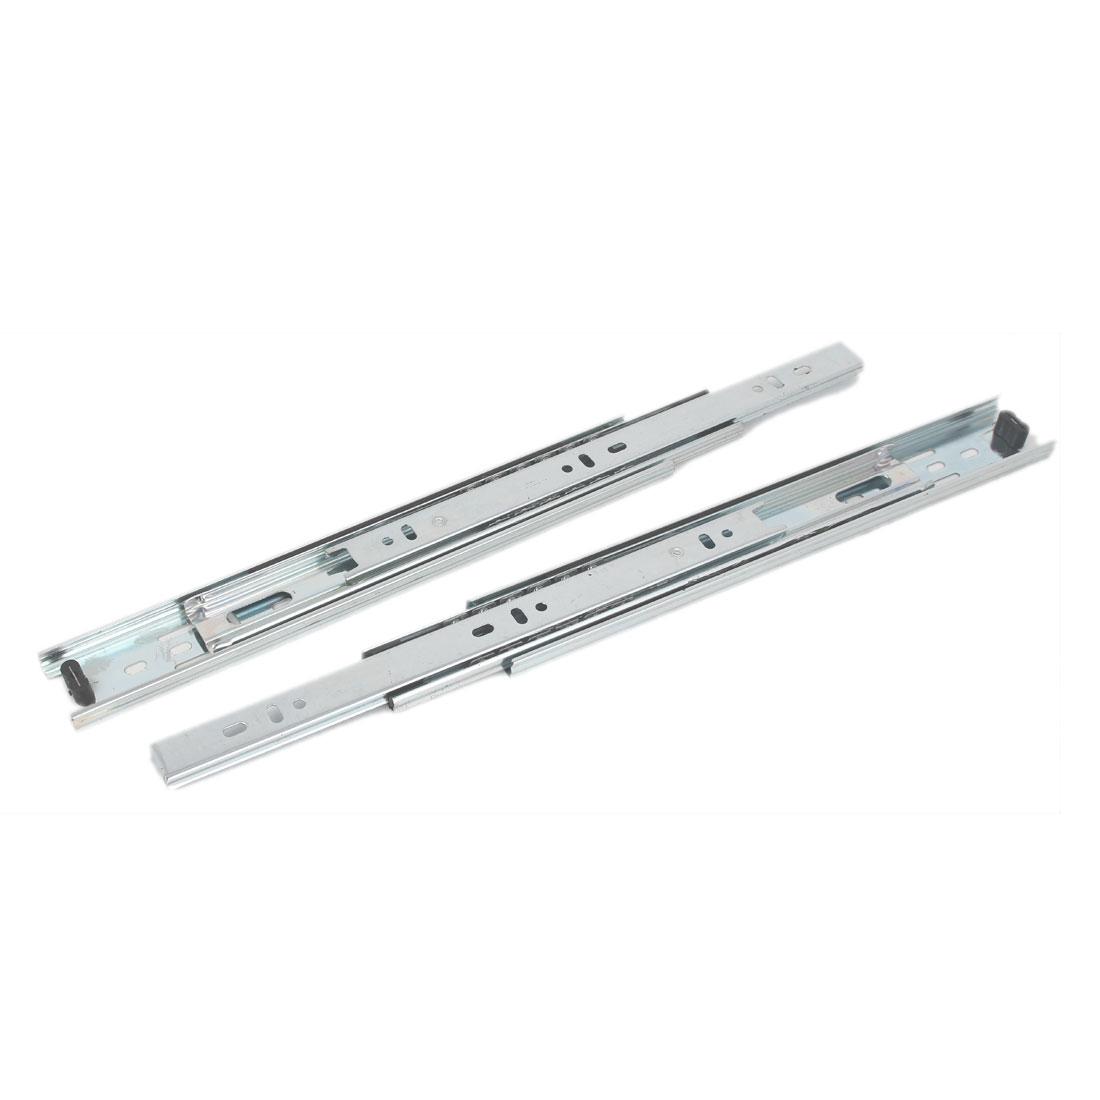 280mm Length Cabinet Drawer Dresser Metal Ball Bearing Slide 2pcs